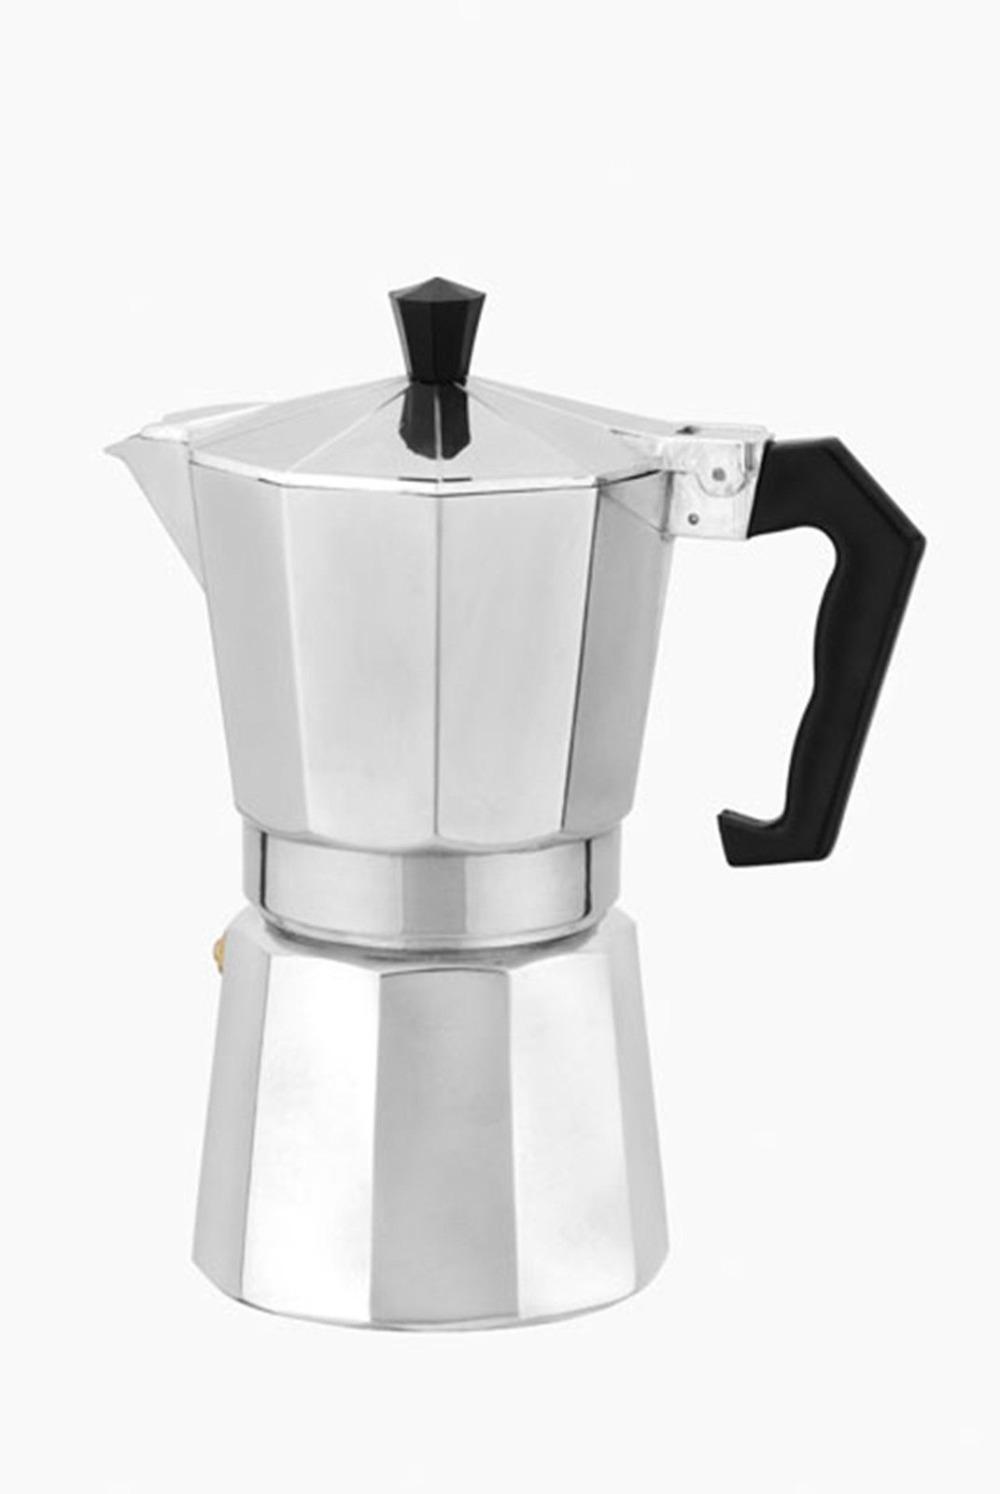 Bialetti,Inoxpran's supplier!!1/2cup Italian Stove top/Moka espresso coffee maker/percolator pot tool(China (Mainland))